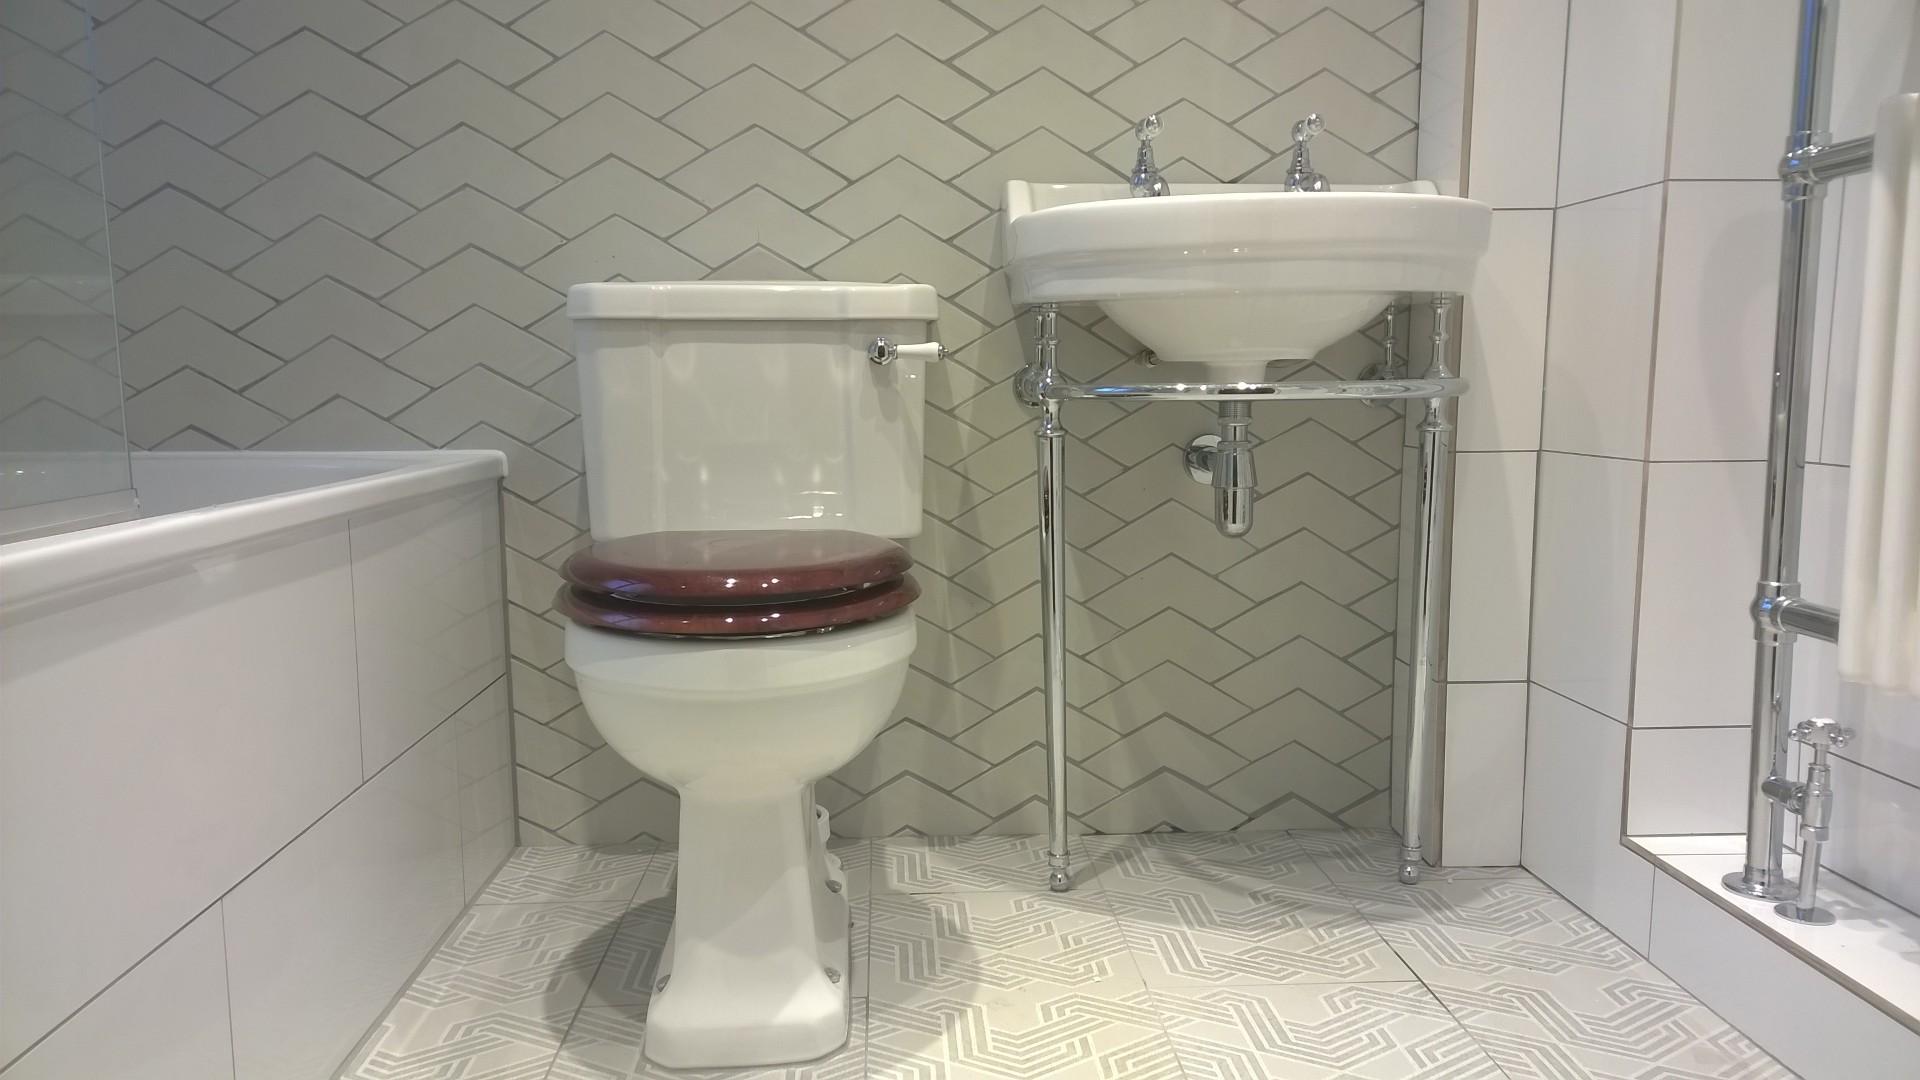 Burlington standard close-coupled pan with slimline lever cistern